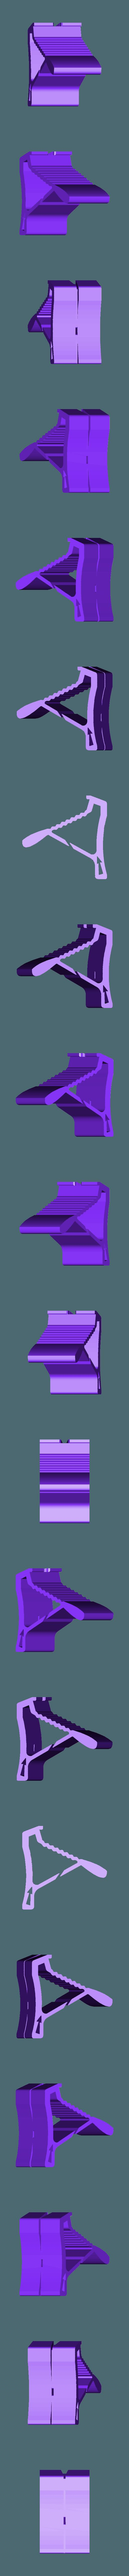 Lambda Smart Device Stand  Small Gap Variation.stl Download free STL file Flexible Phone Stand v2.0 • 3D printer model, Milanorage